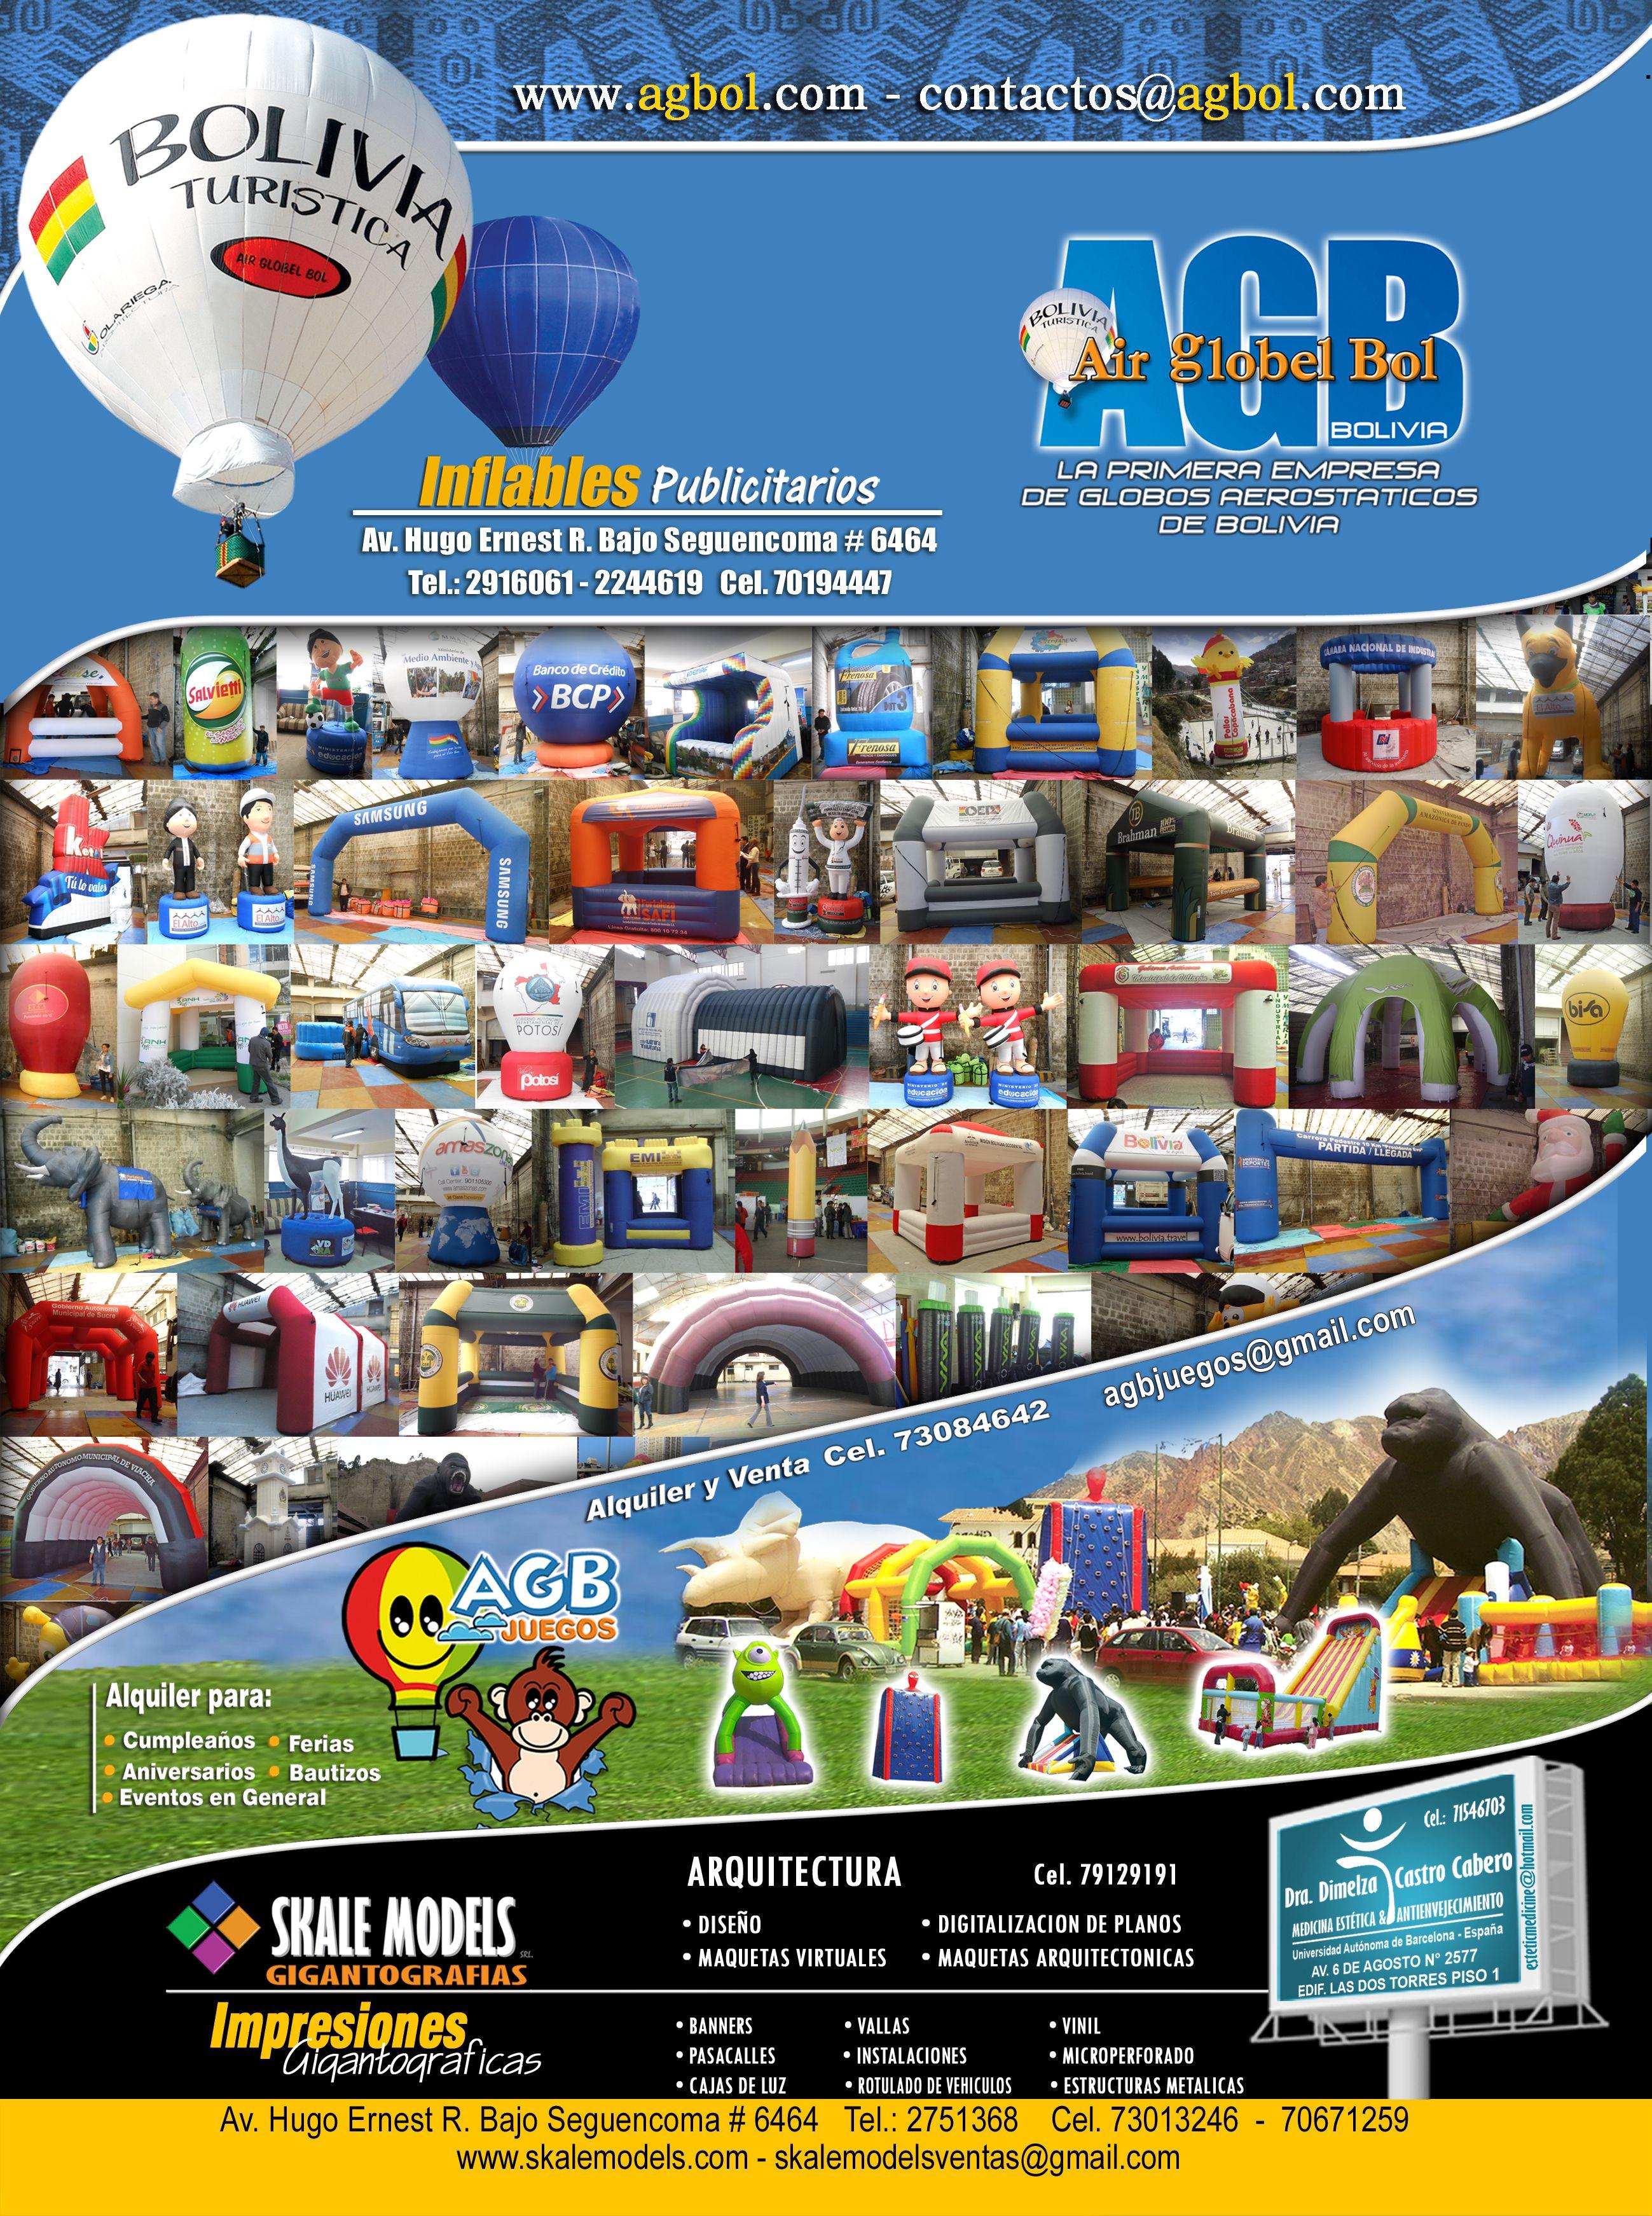 Expo Stand Bolivia : Agb bolivia